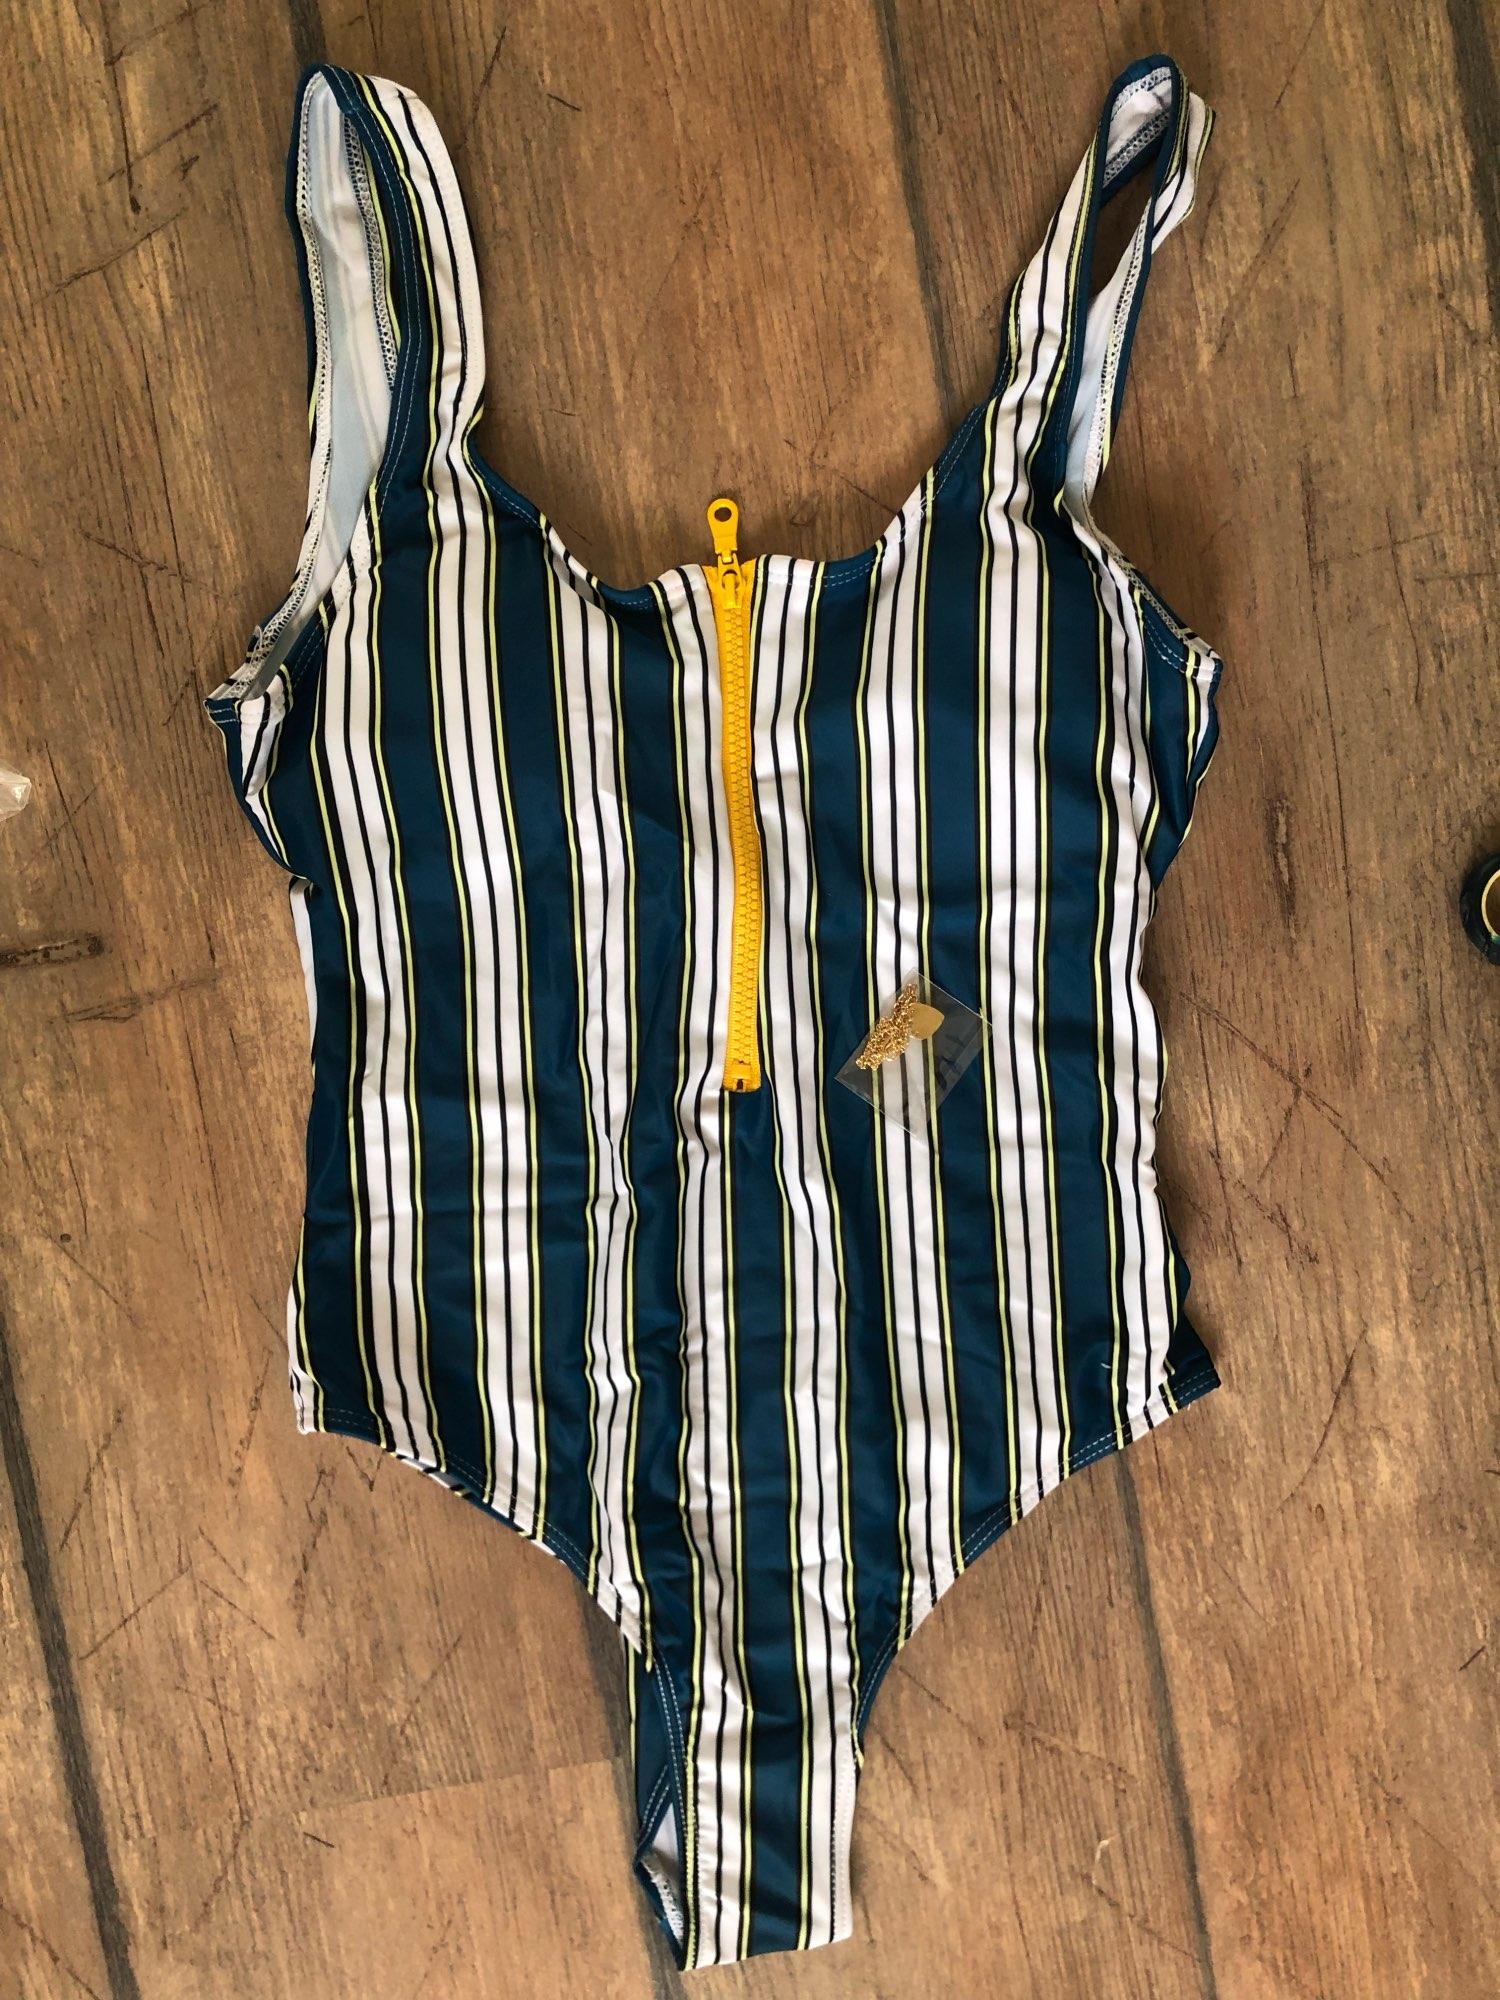 2021 New Sexy Zipper One Piece Swimsuit Women Swimwear Push Up Monokini Bodysuit Swimsuit Print Bathing Suit Summer Beachwear XL Body Suits    - AliExpress